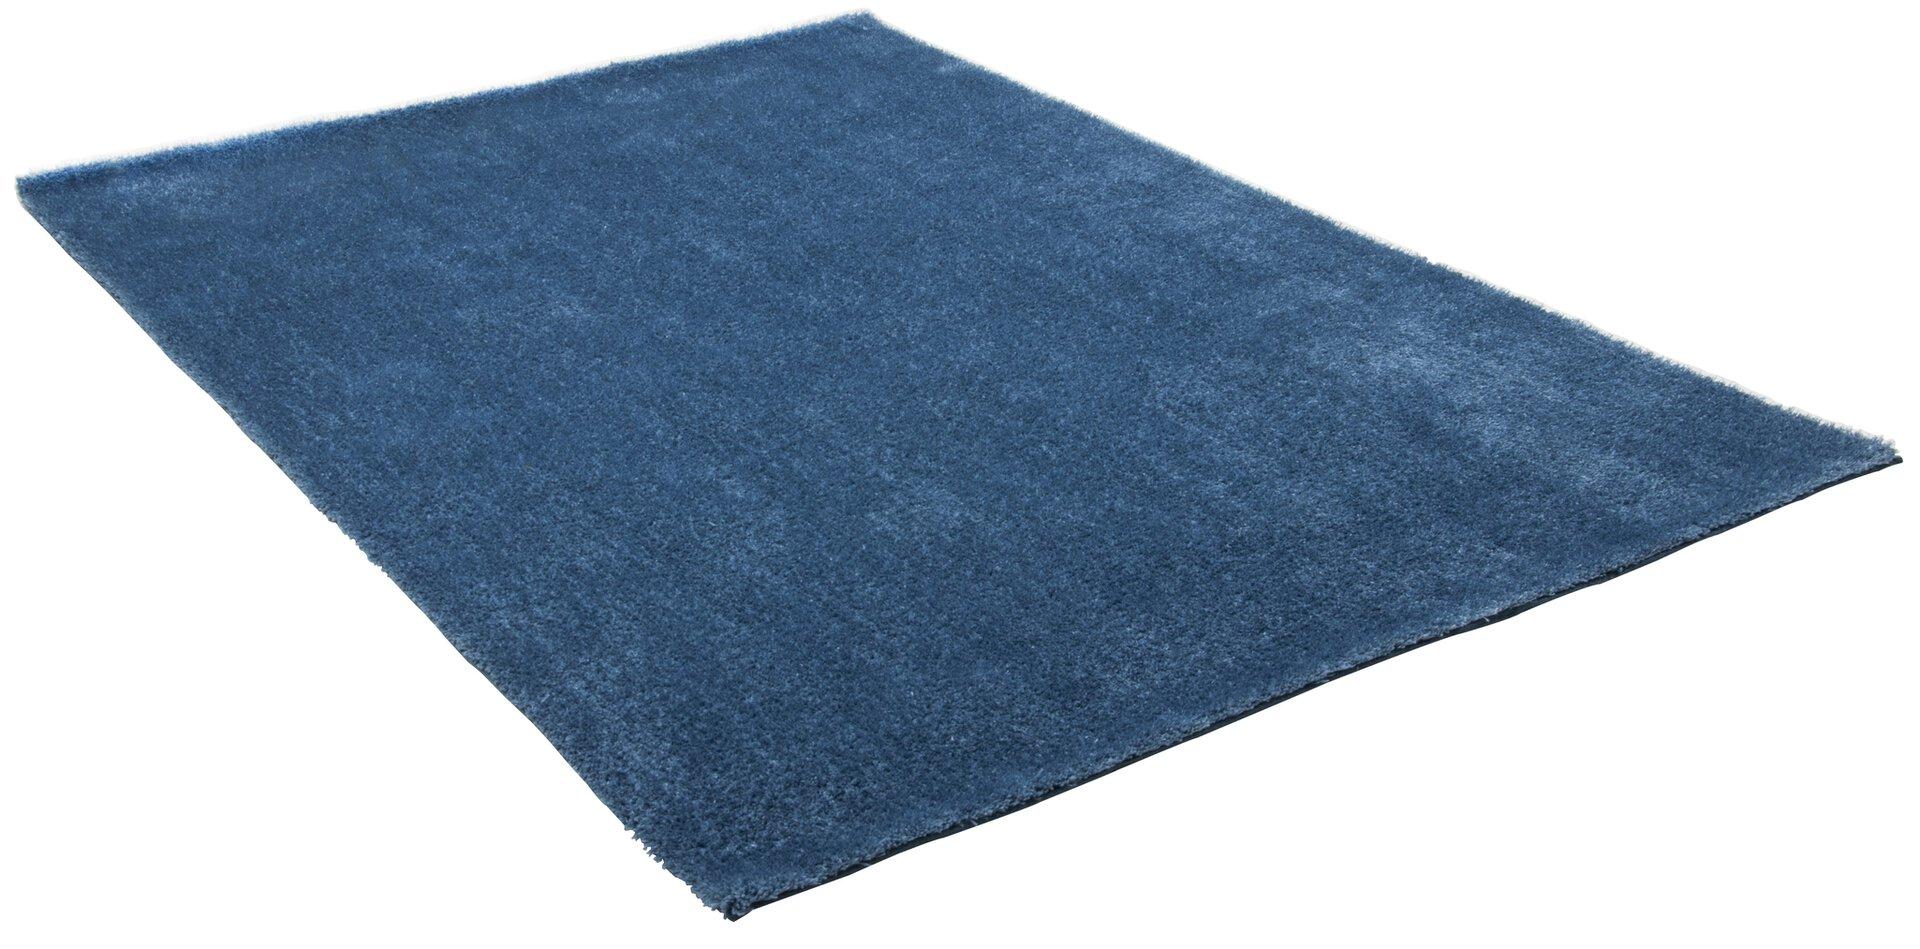 Handtuftteppich Alessandro Gino Falcone Textil Blau 50 x 80 cm